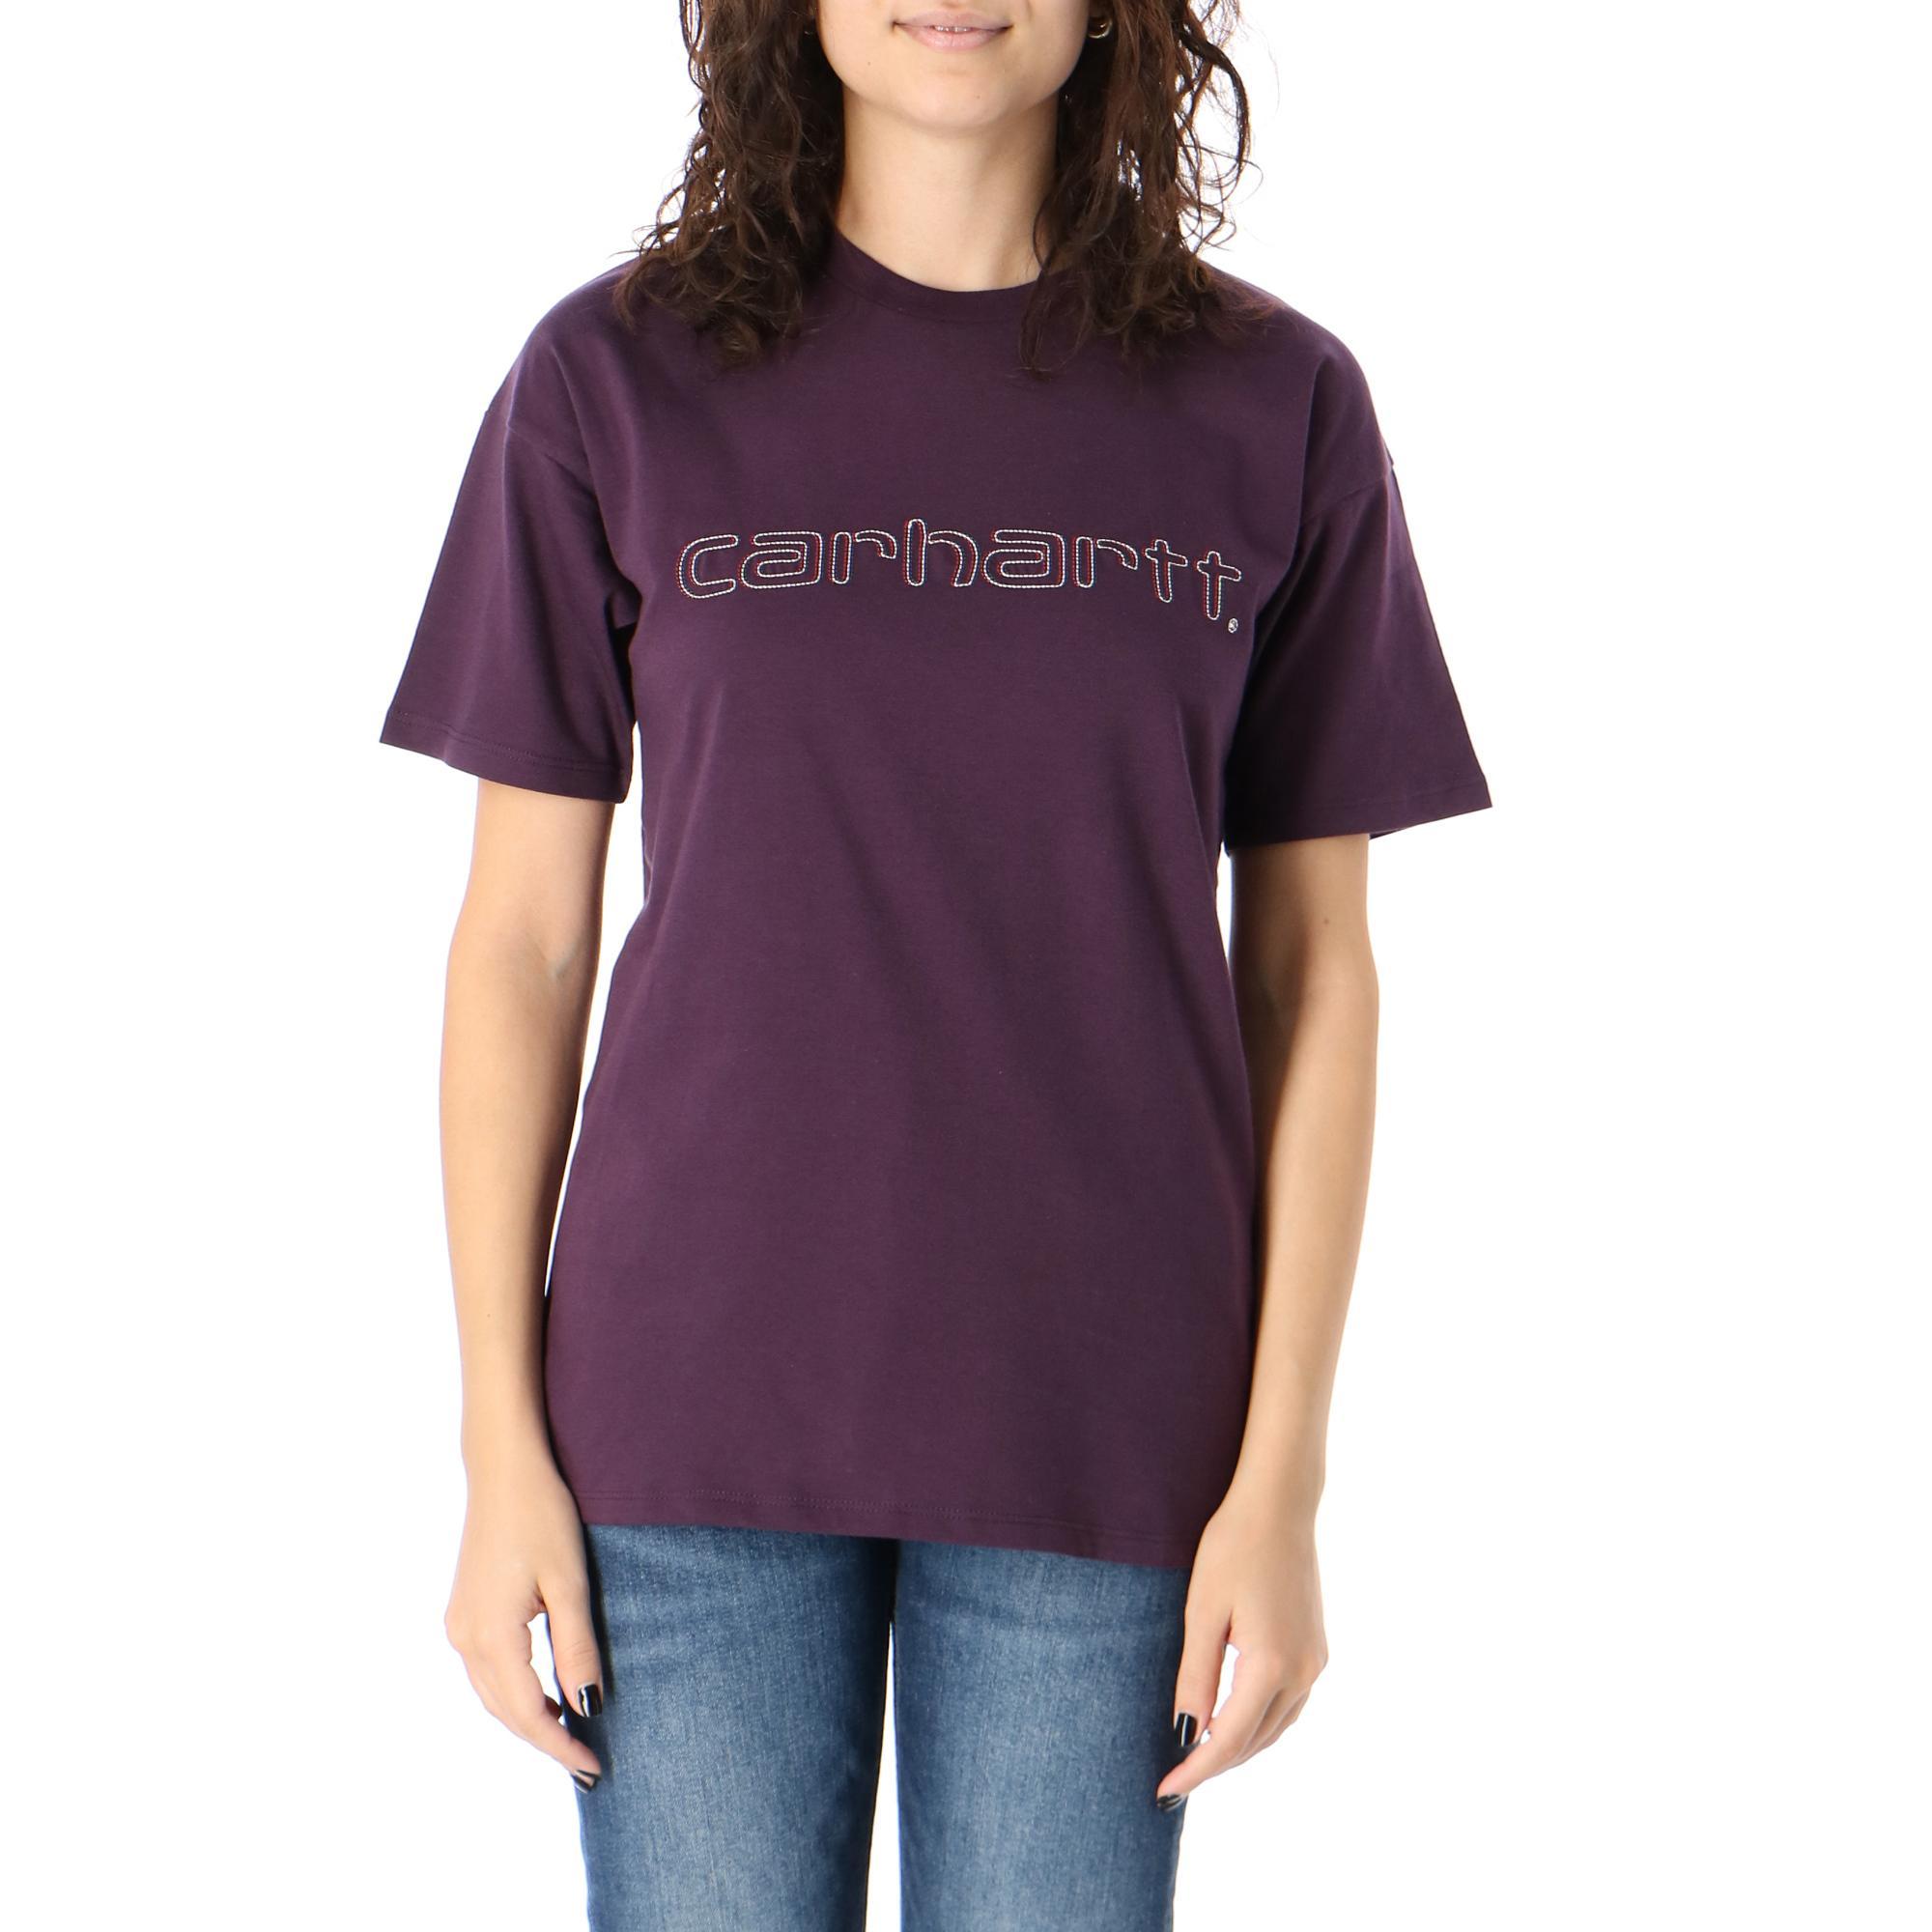 Carhartt W S/s Commission Script T-shirt Boysenberry